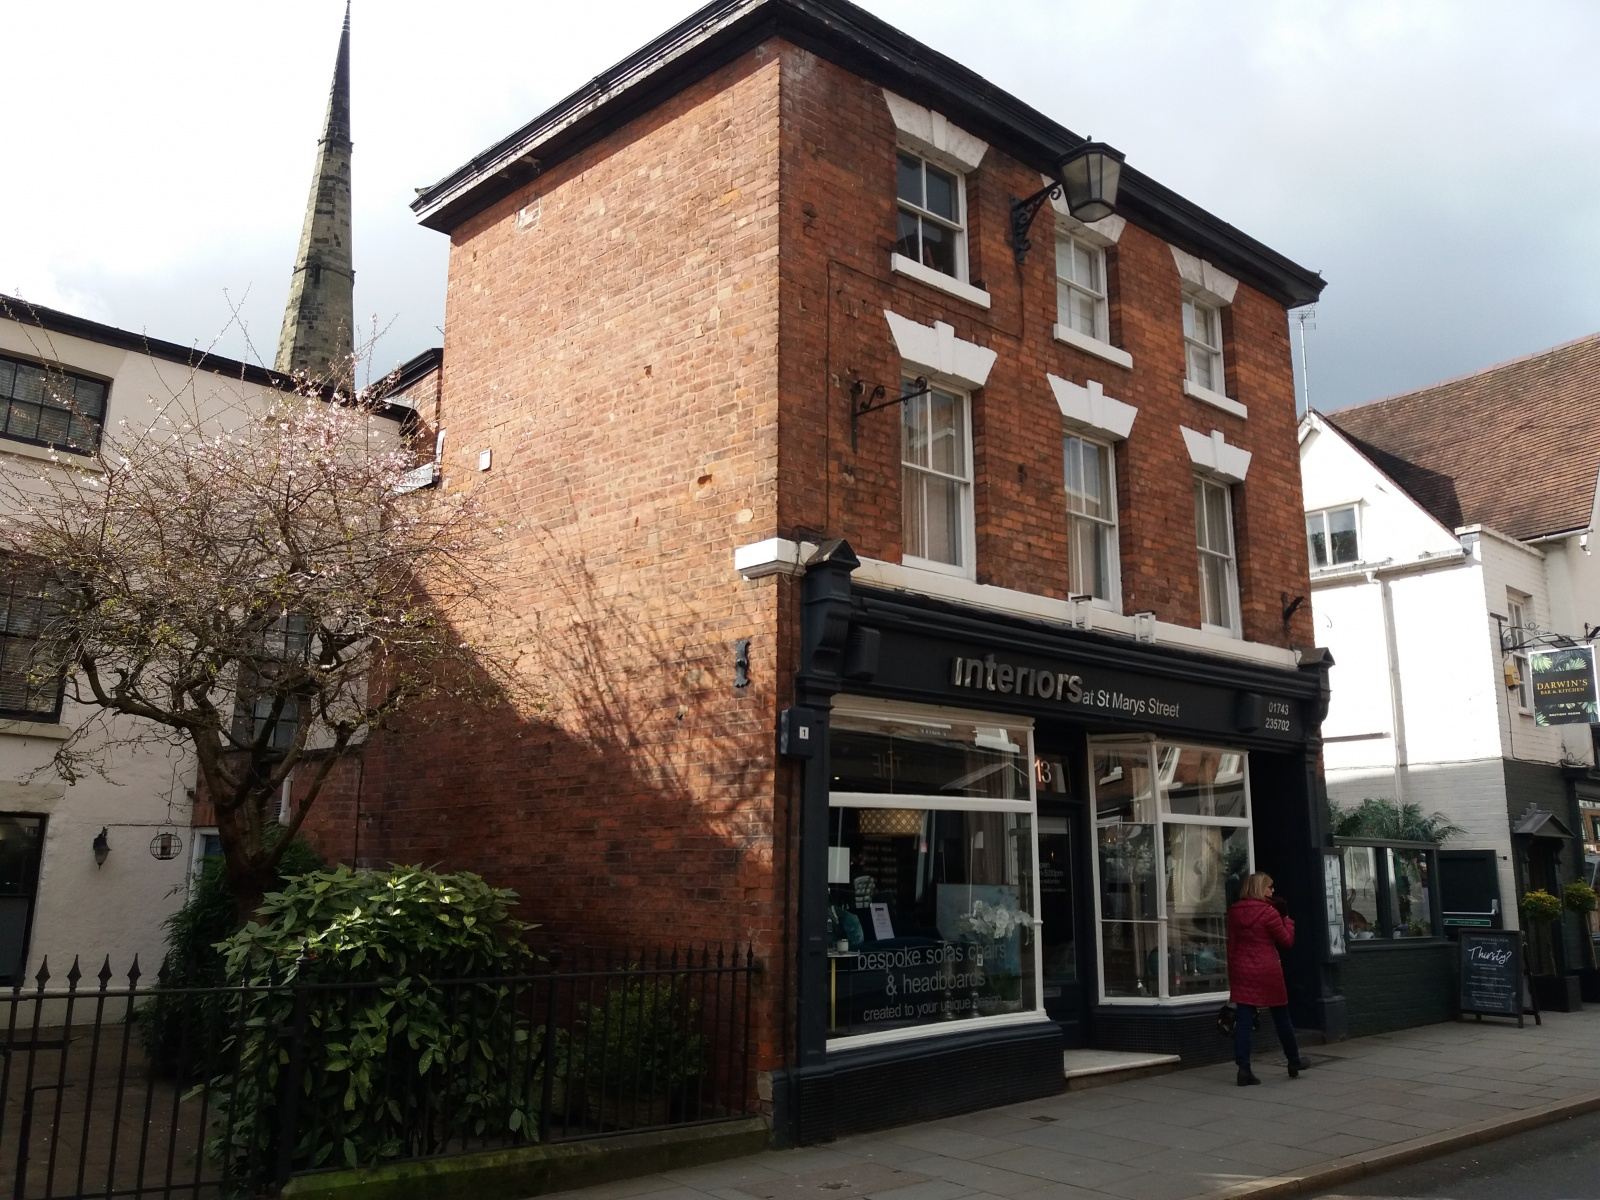 13 & 13a, St. Marys Street, Shrewsbury, Shropshire